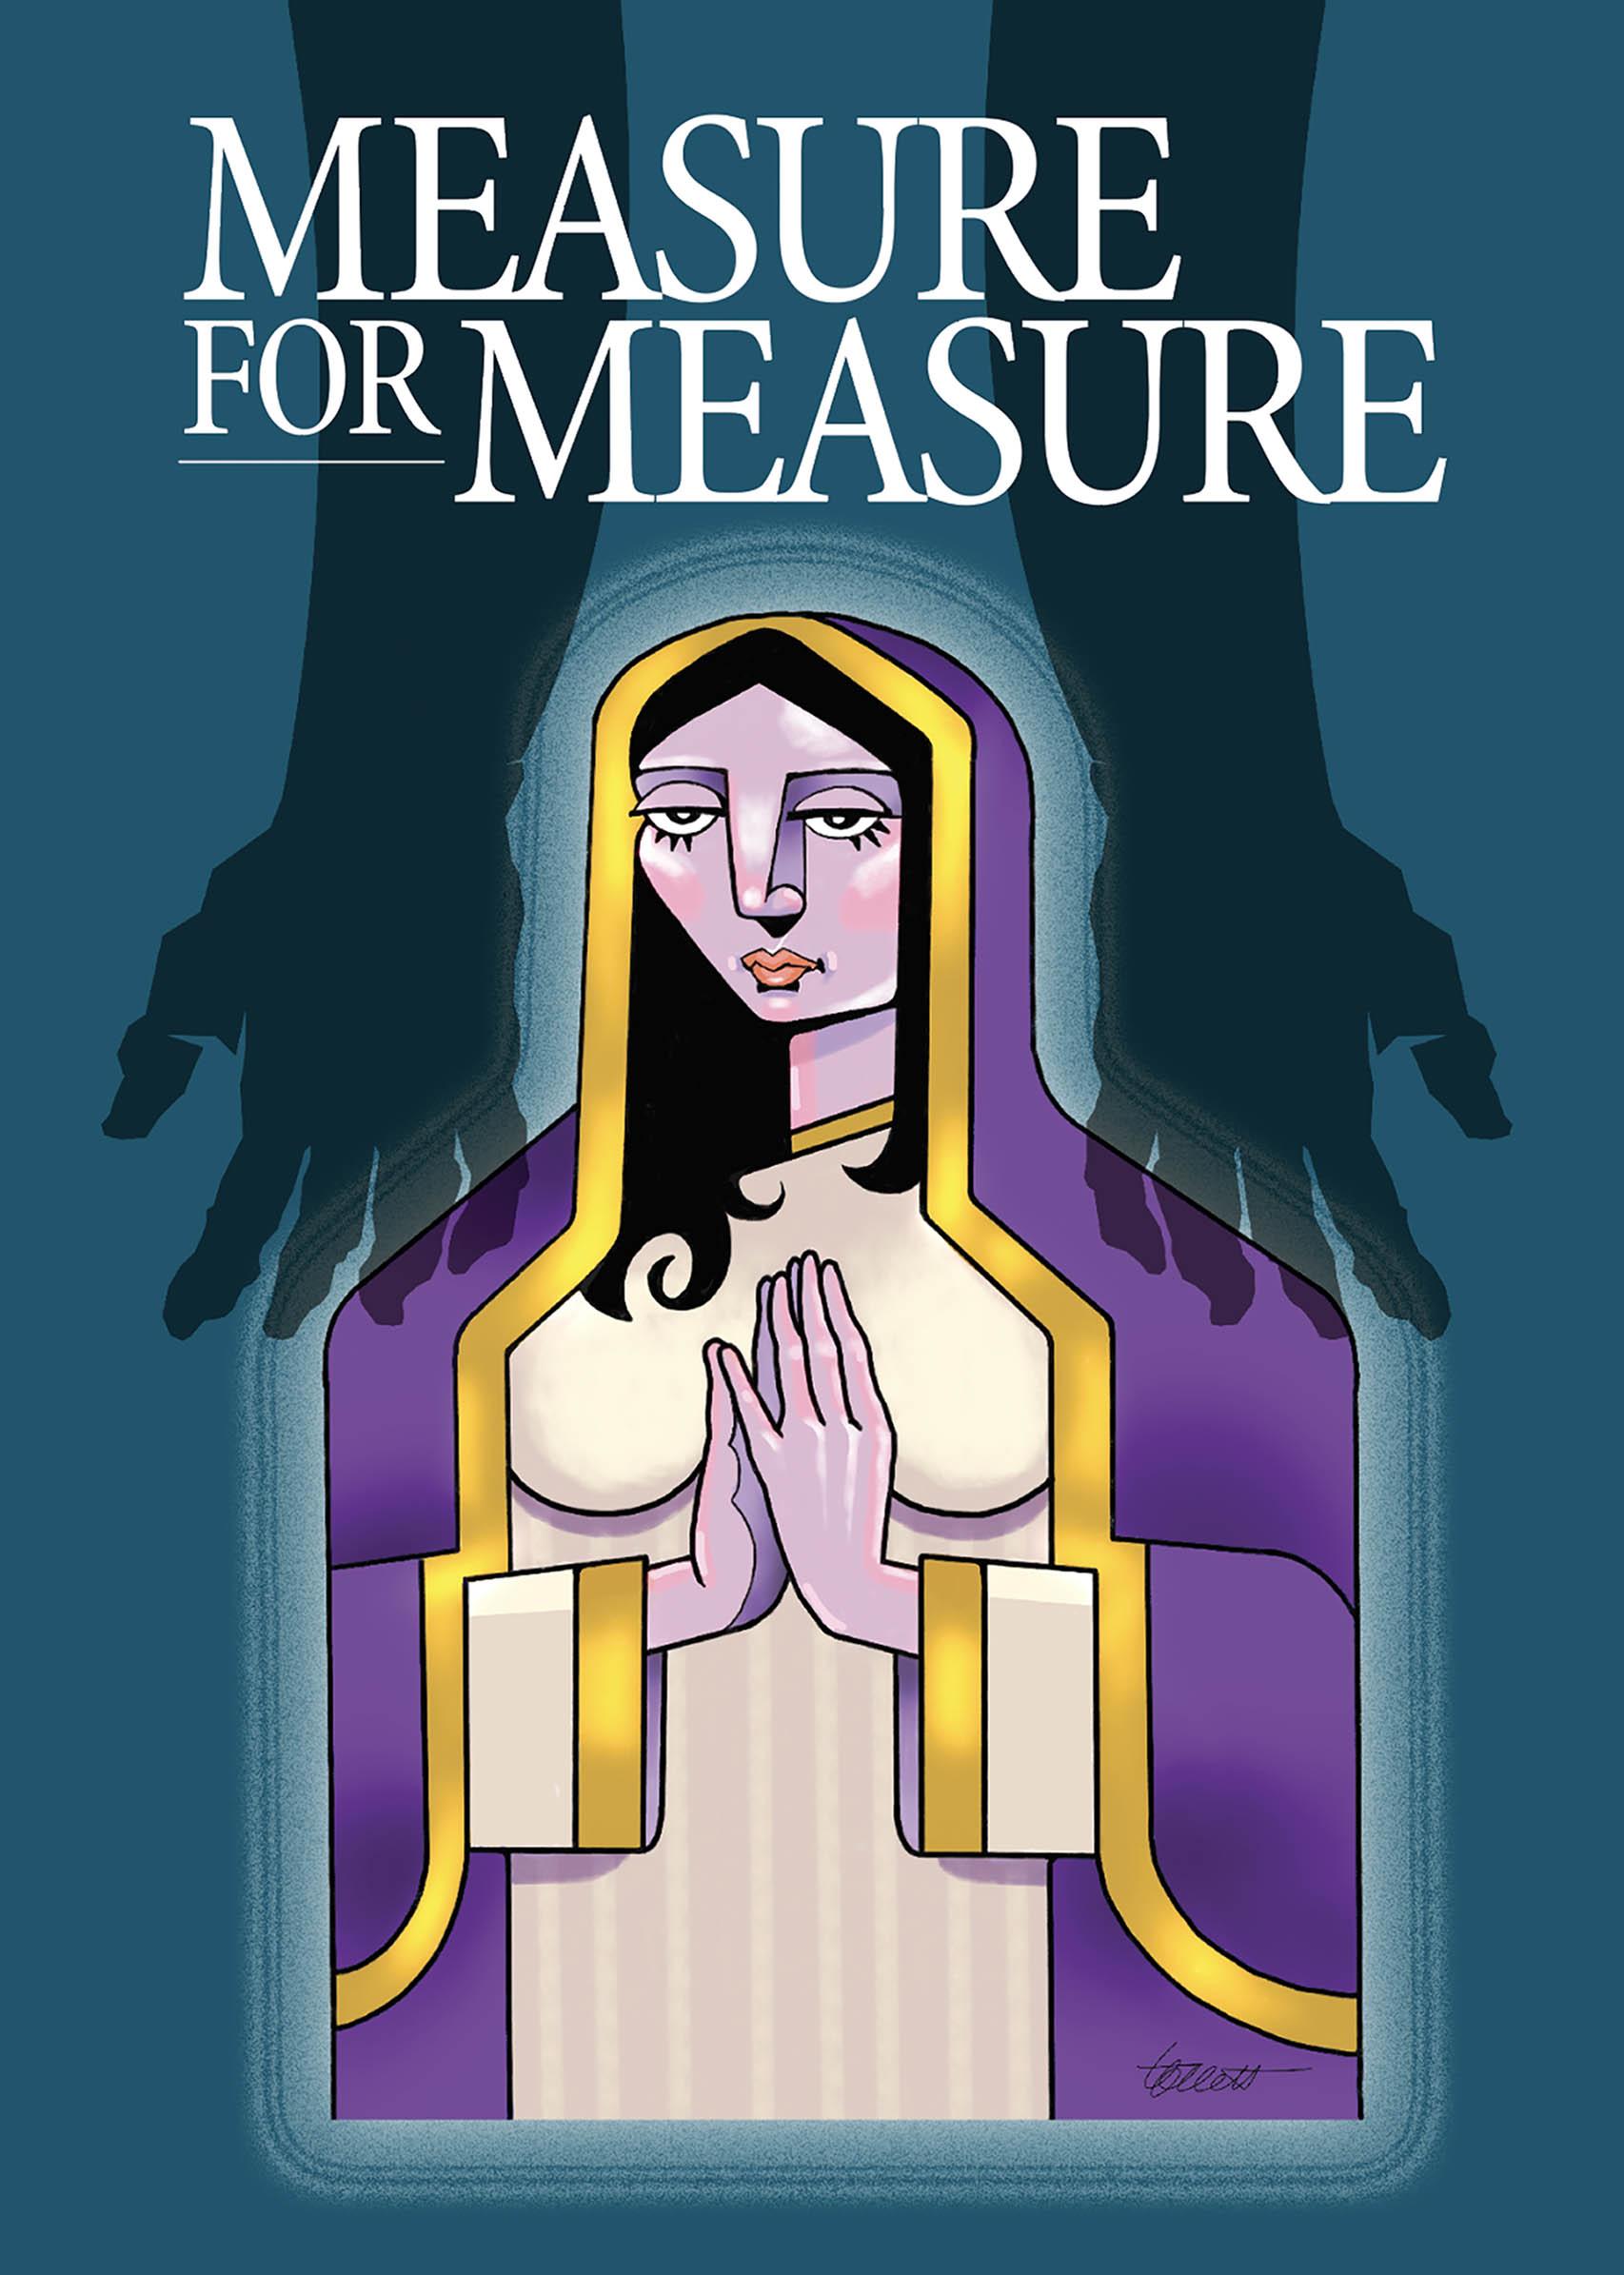 Measure for Measure image.jpg